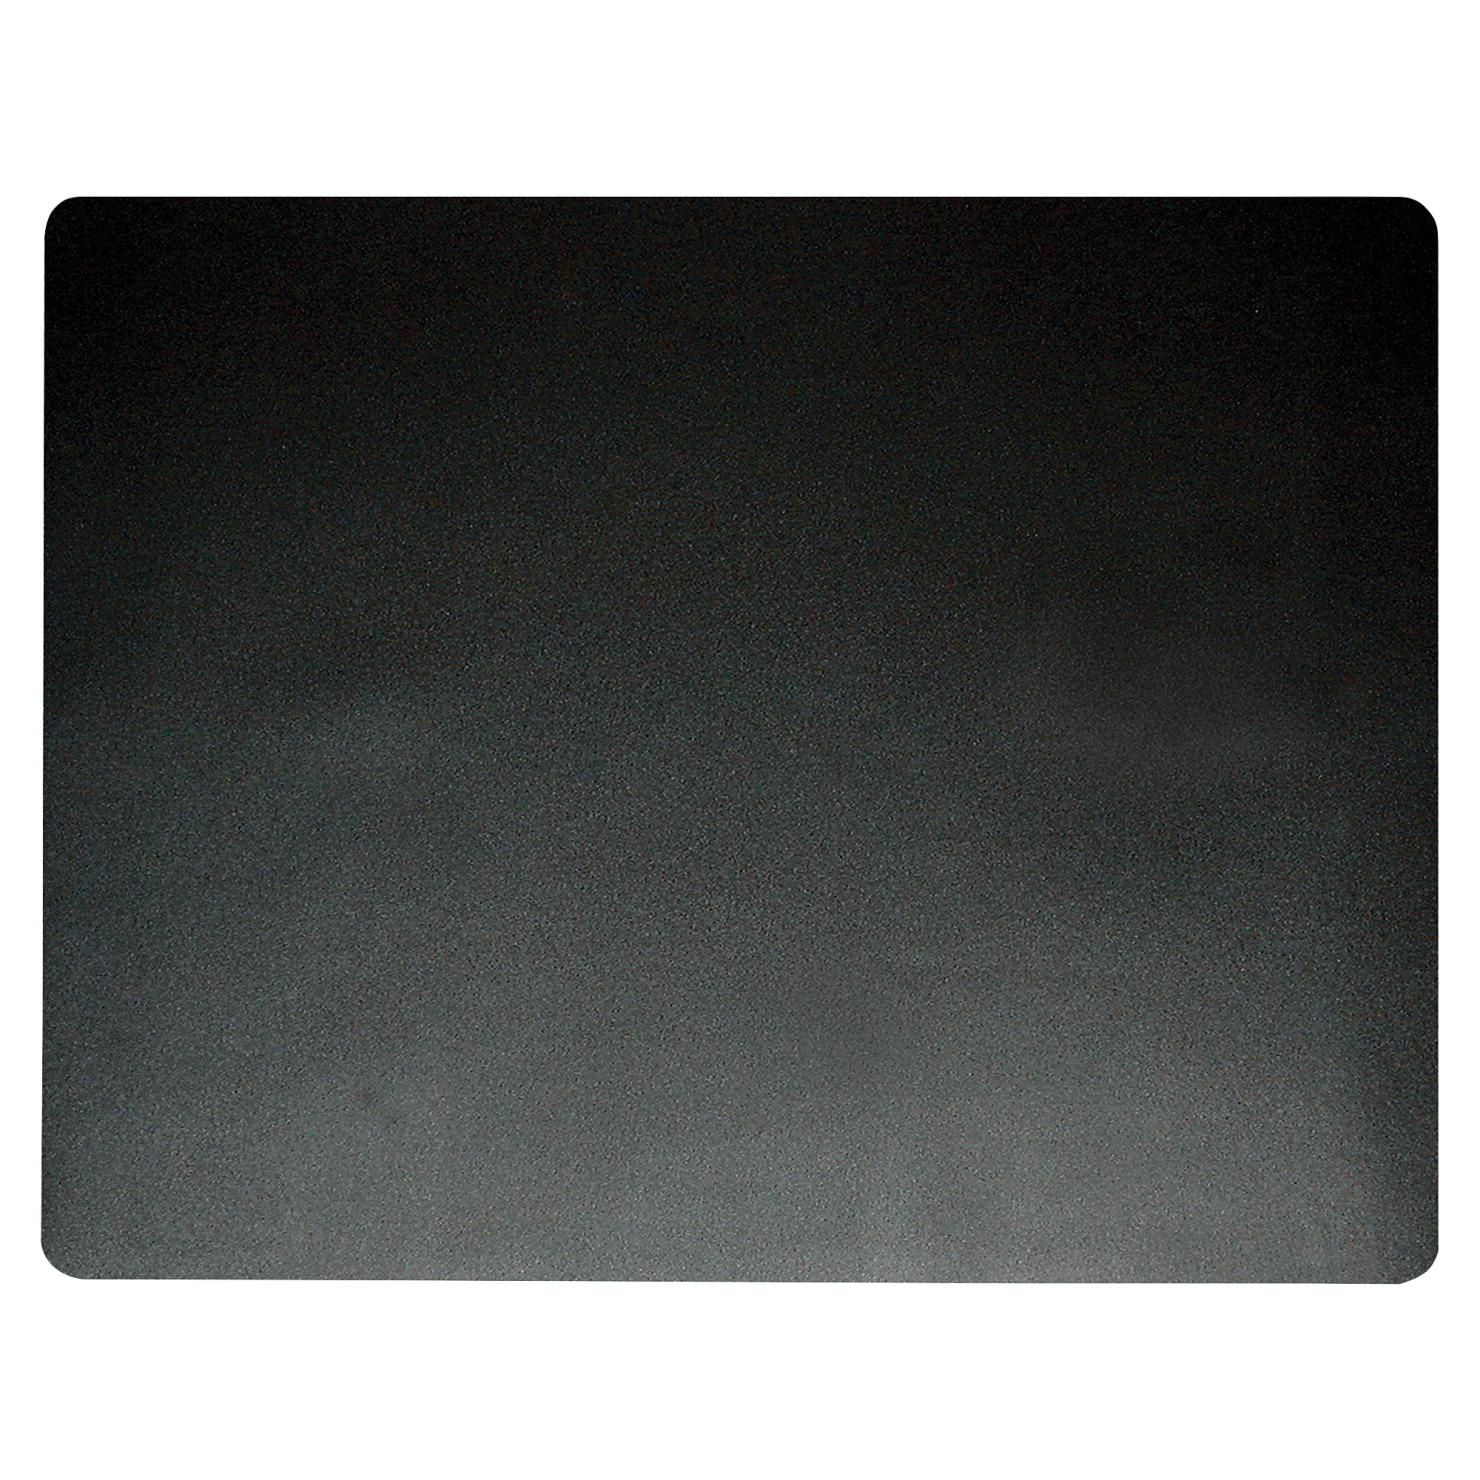 Artistic Desk Pad 19 X 24 In Black